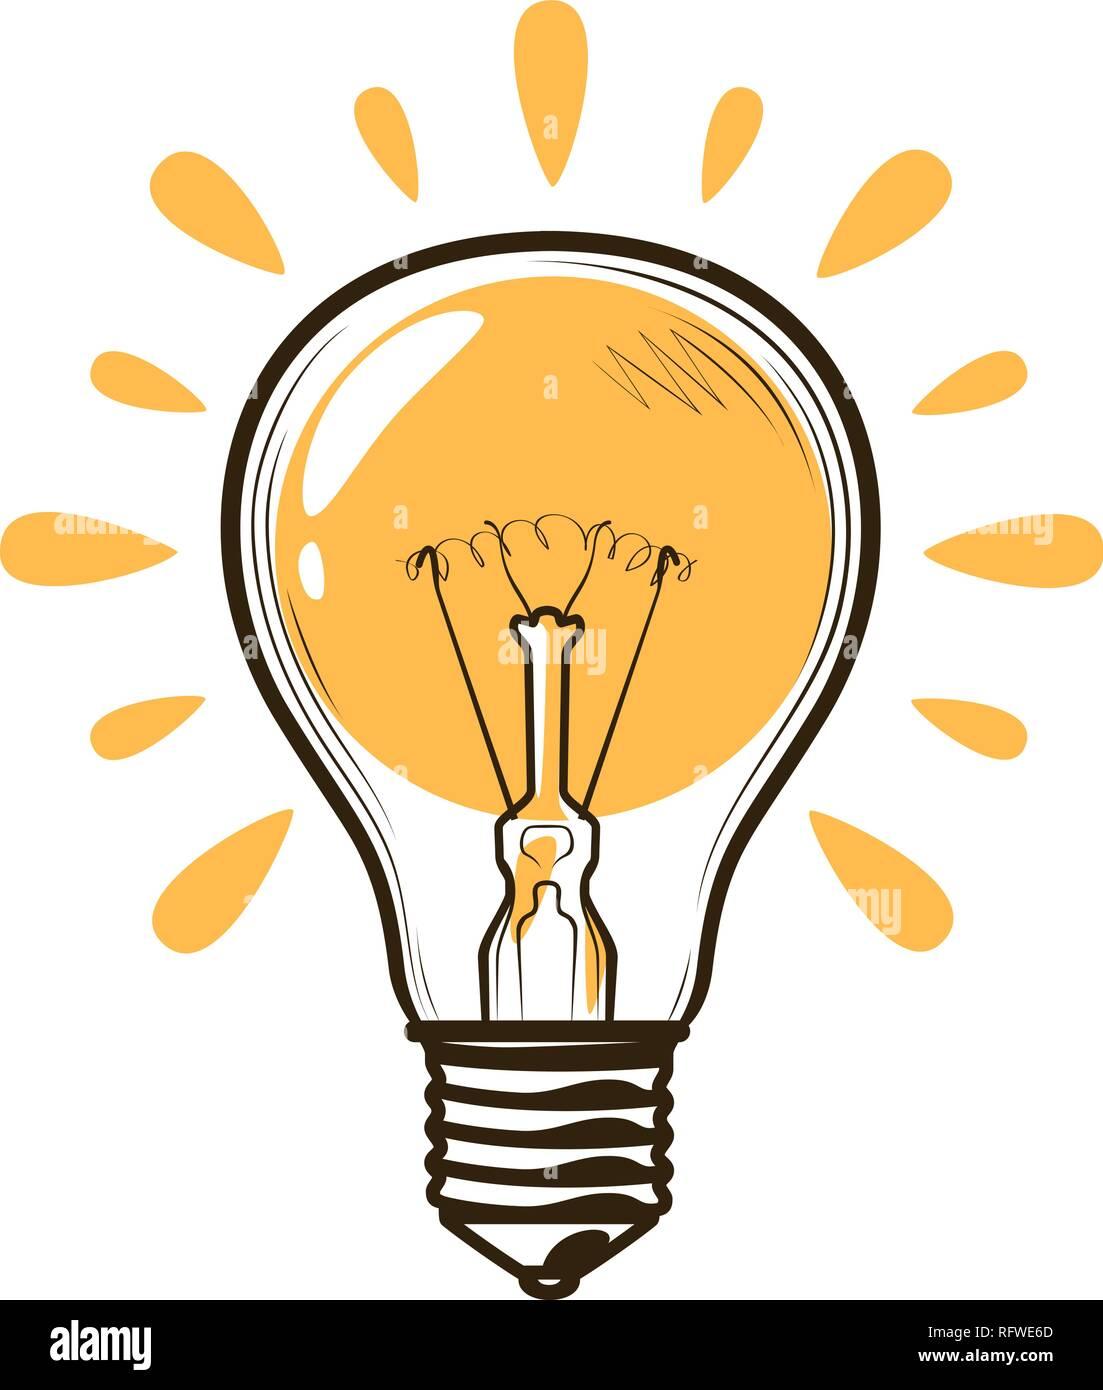 lightbulb  bulb  electricity  electric light  energy